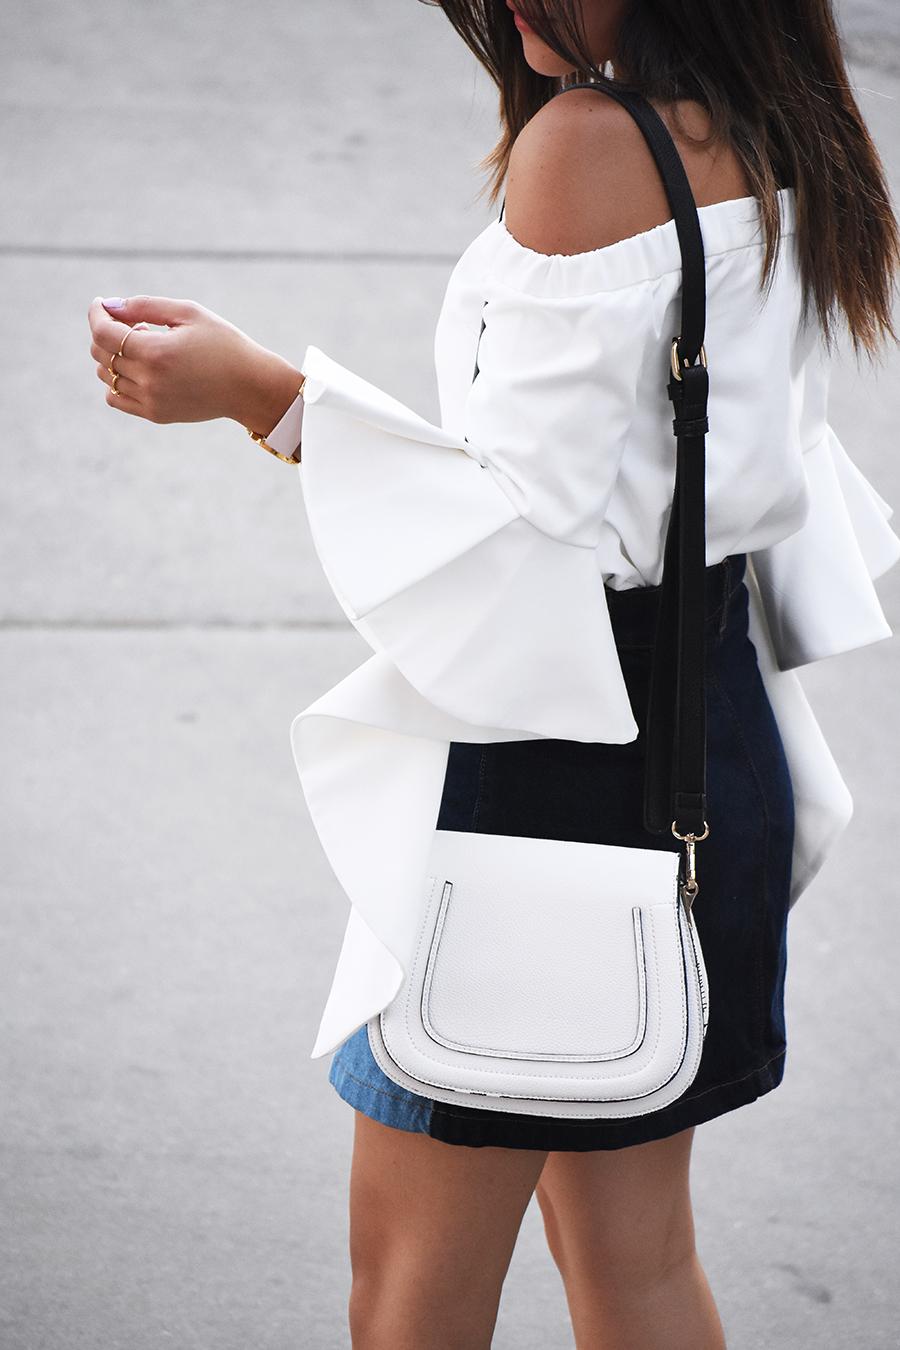 Solesociety white bag